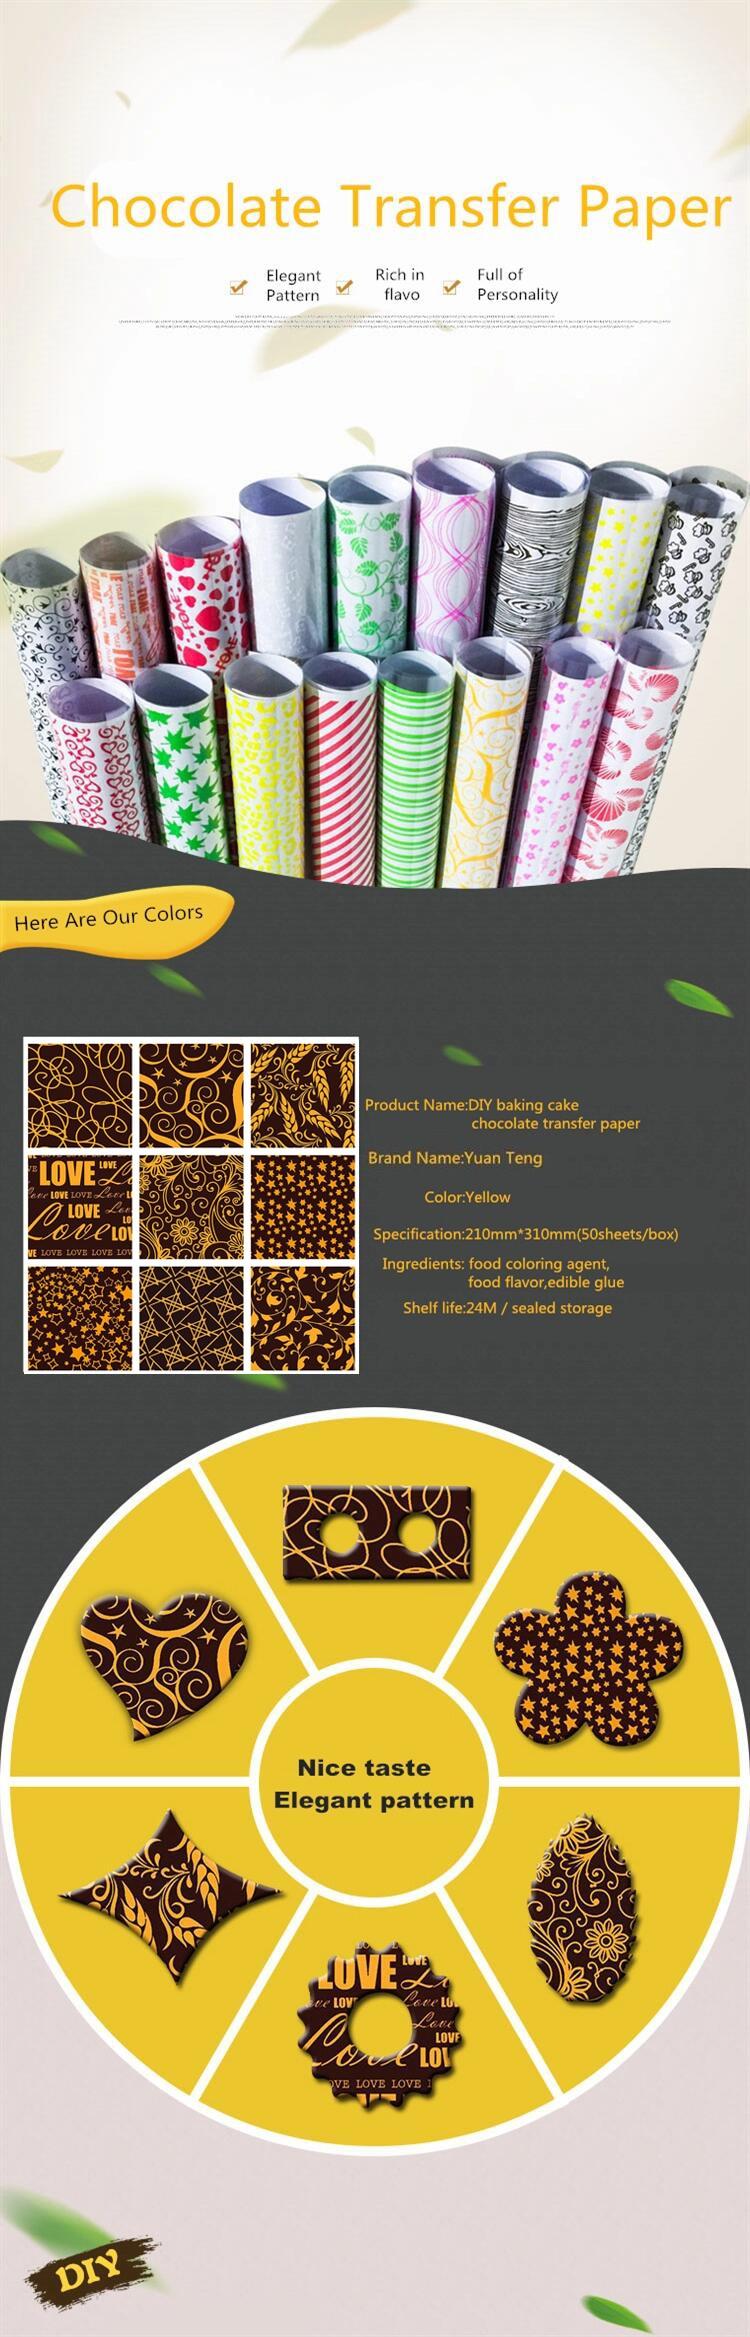 Transfer chocolate DIY Chocolate Mold Mix Hot Design ??